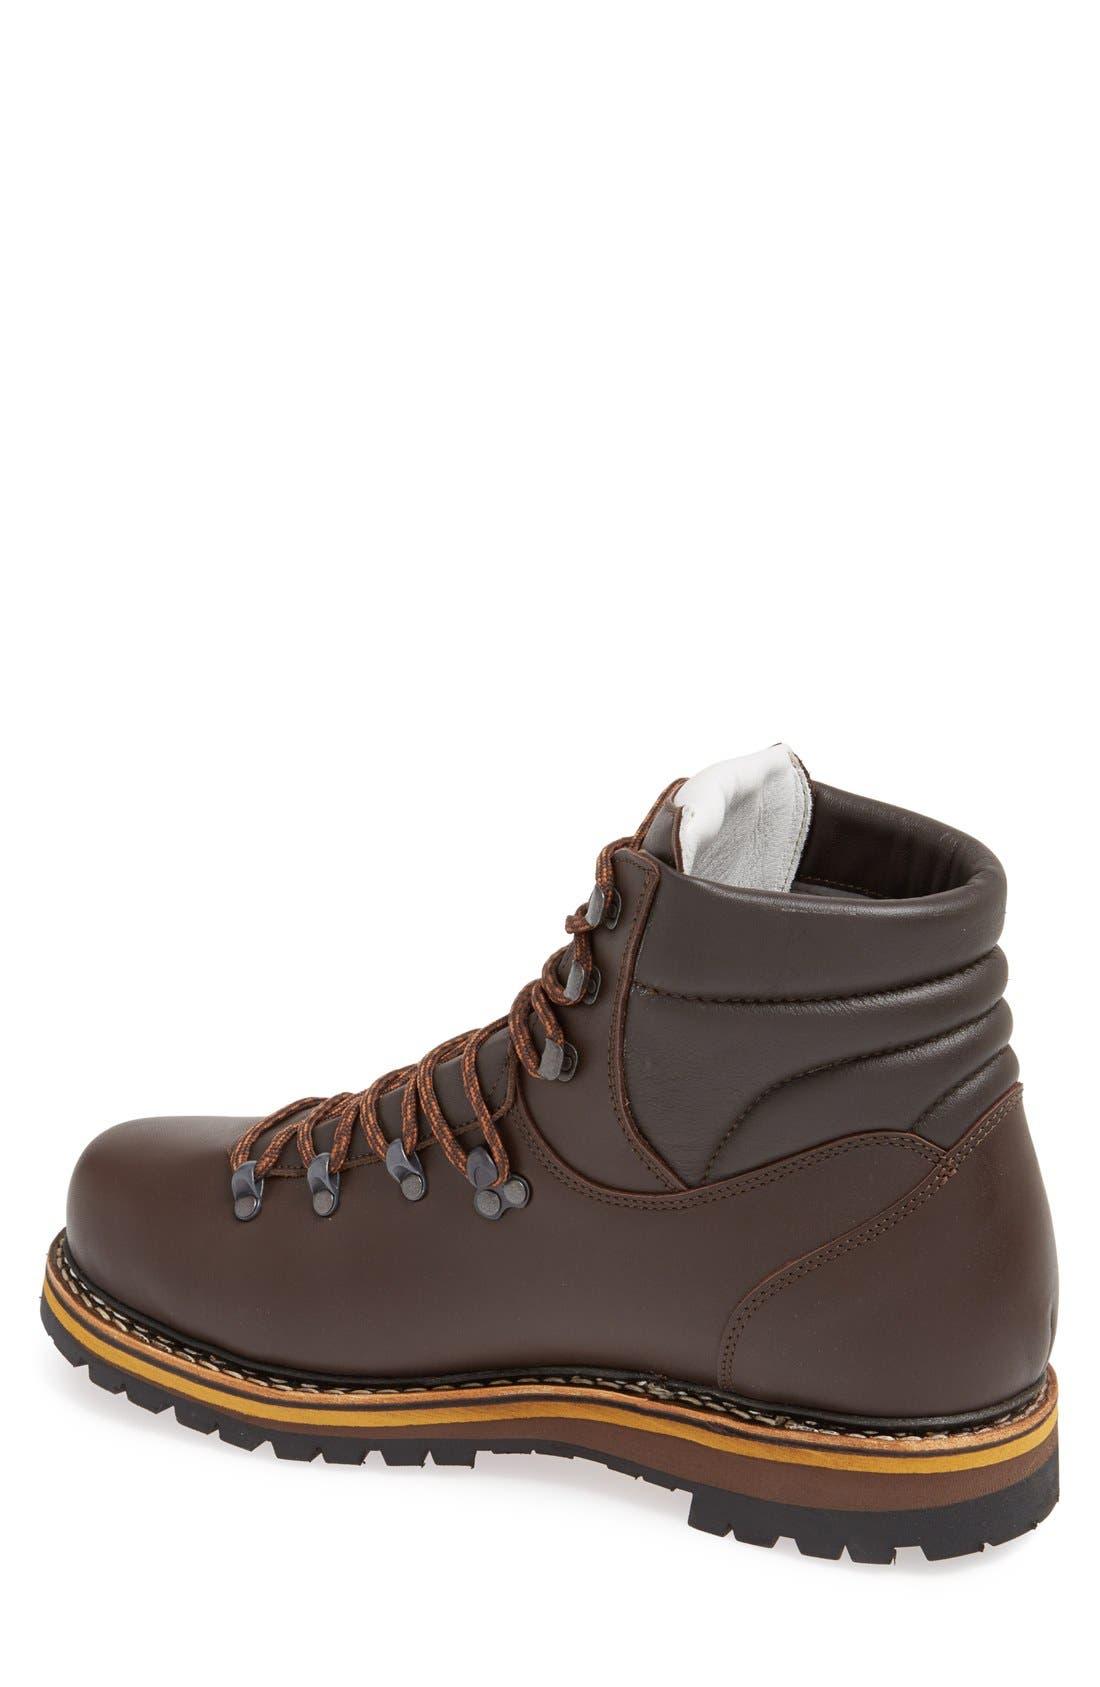 Alternate Image 2  - Hanwag 'Grunten' Hiking Boot (Men)